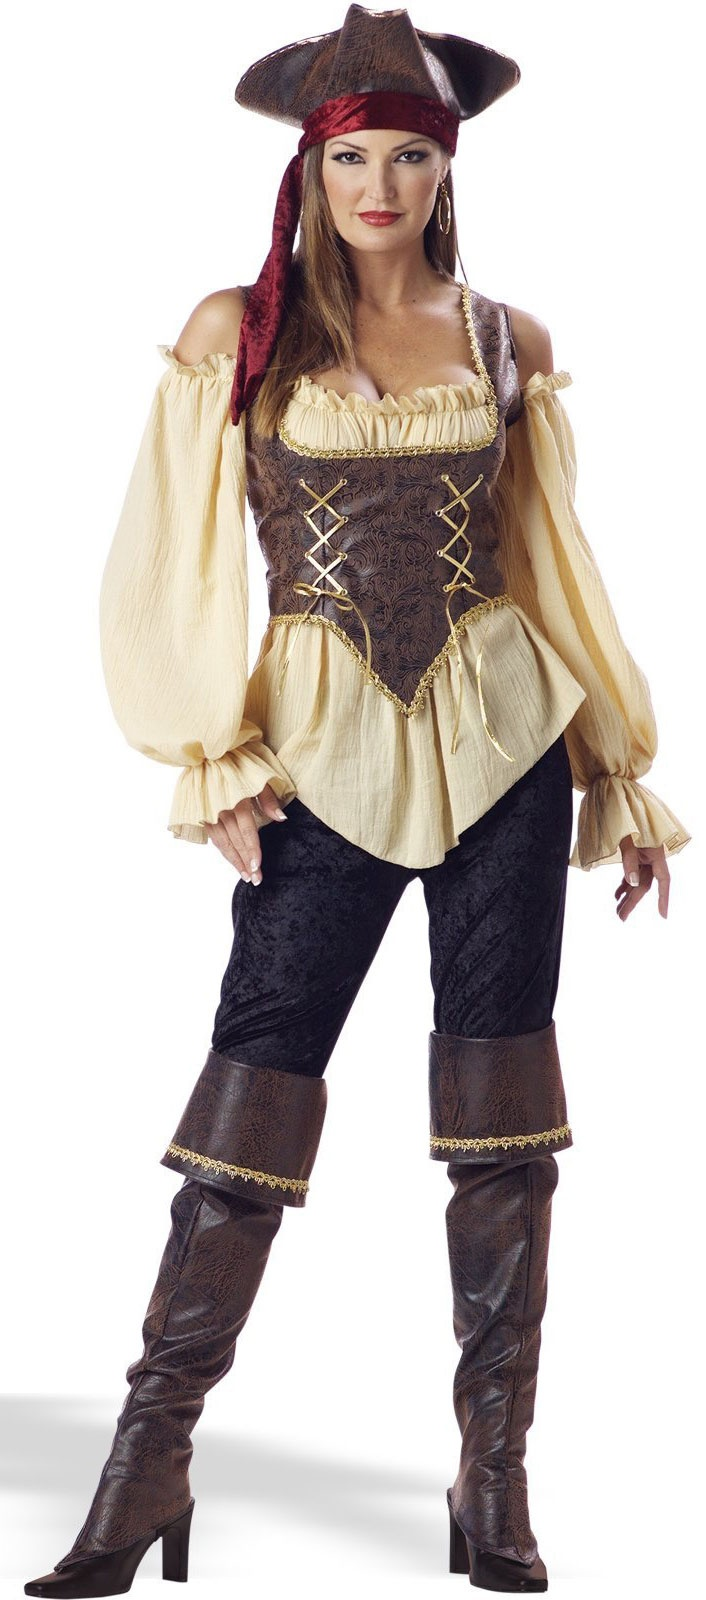 Rustic Pirate Lady Adult Costume